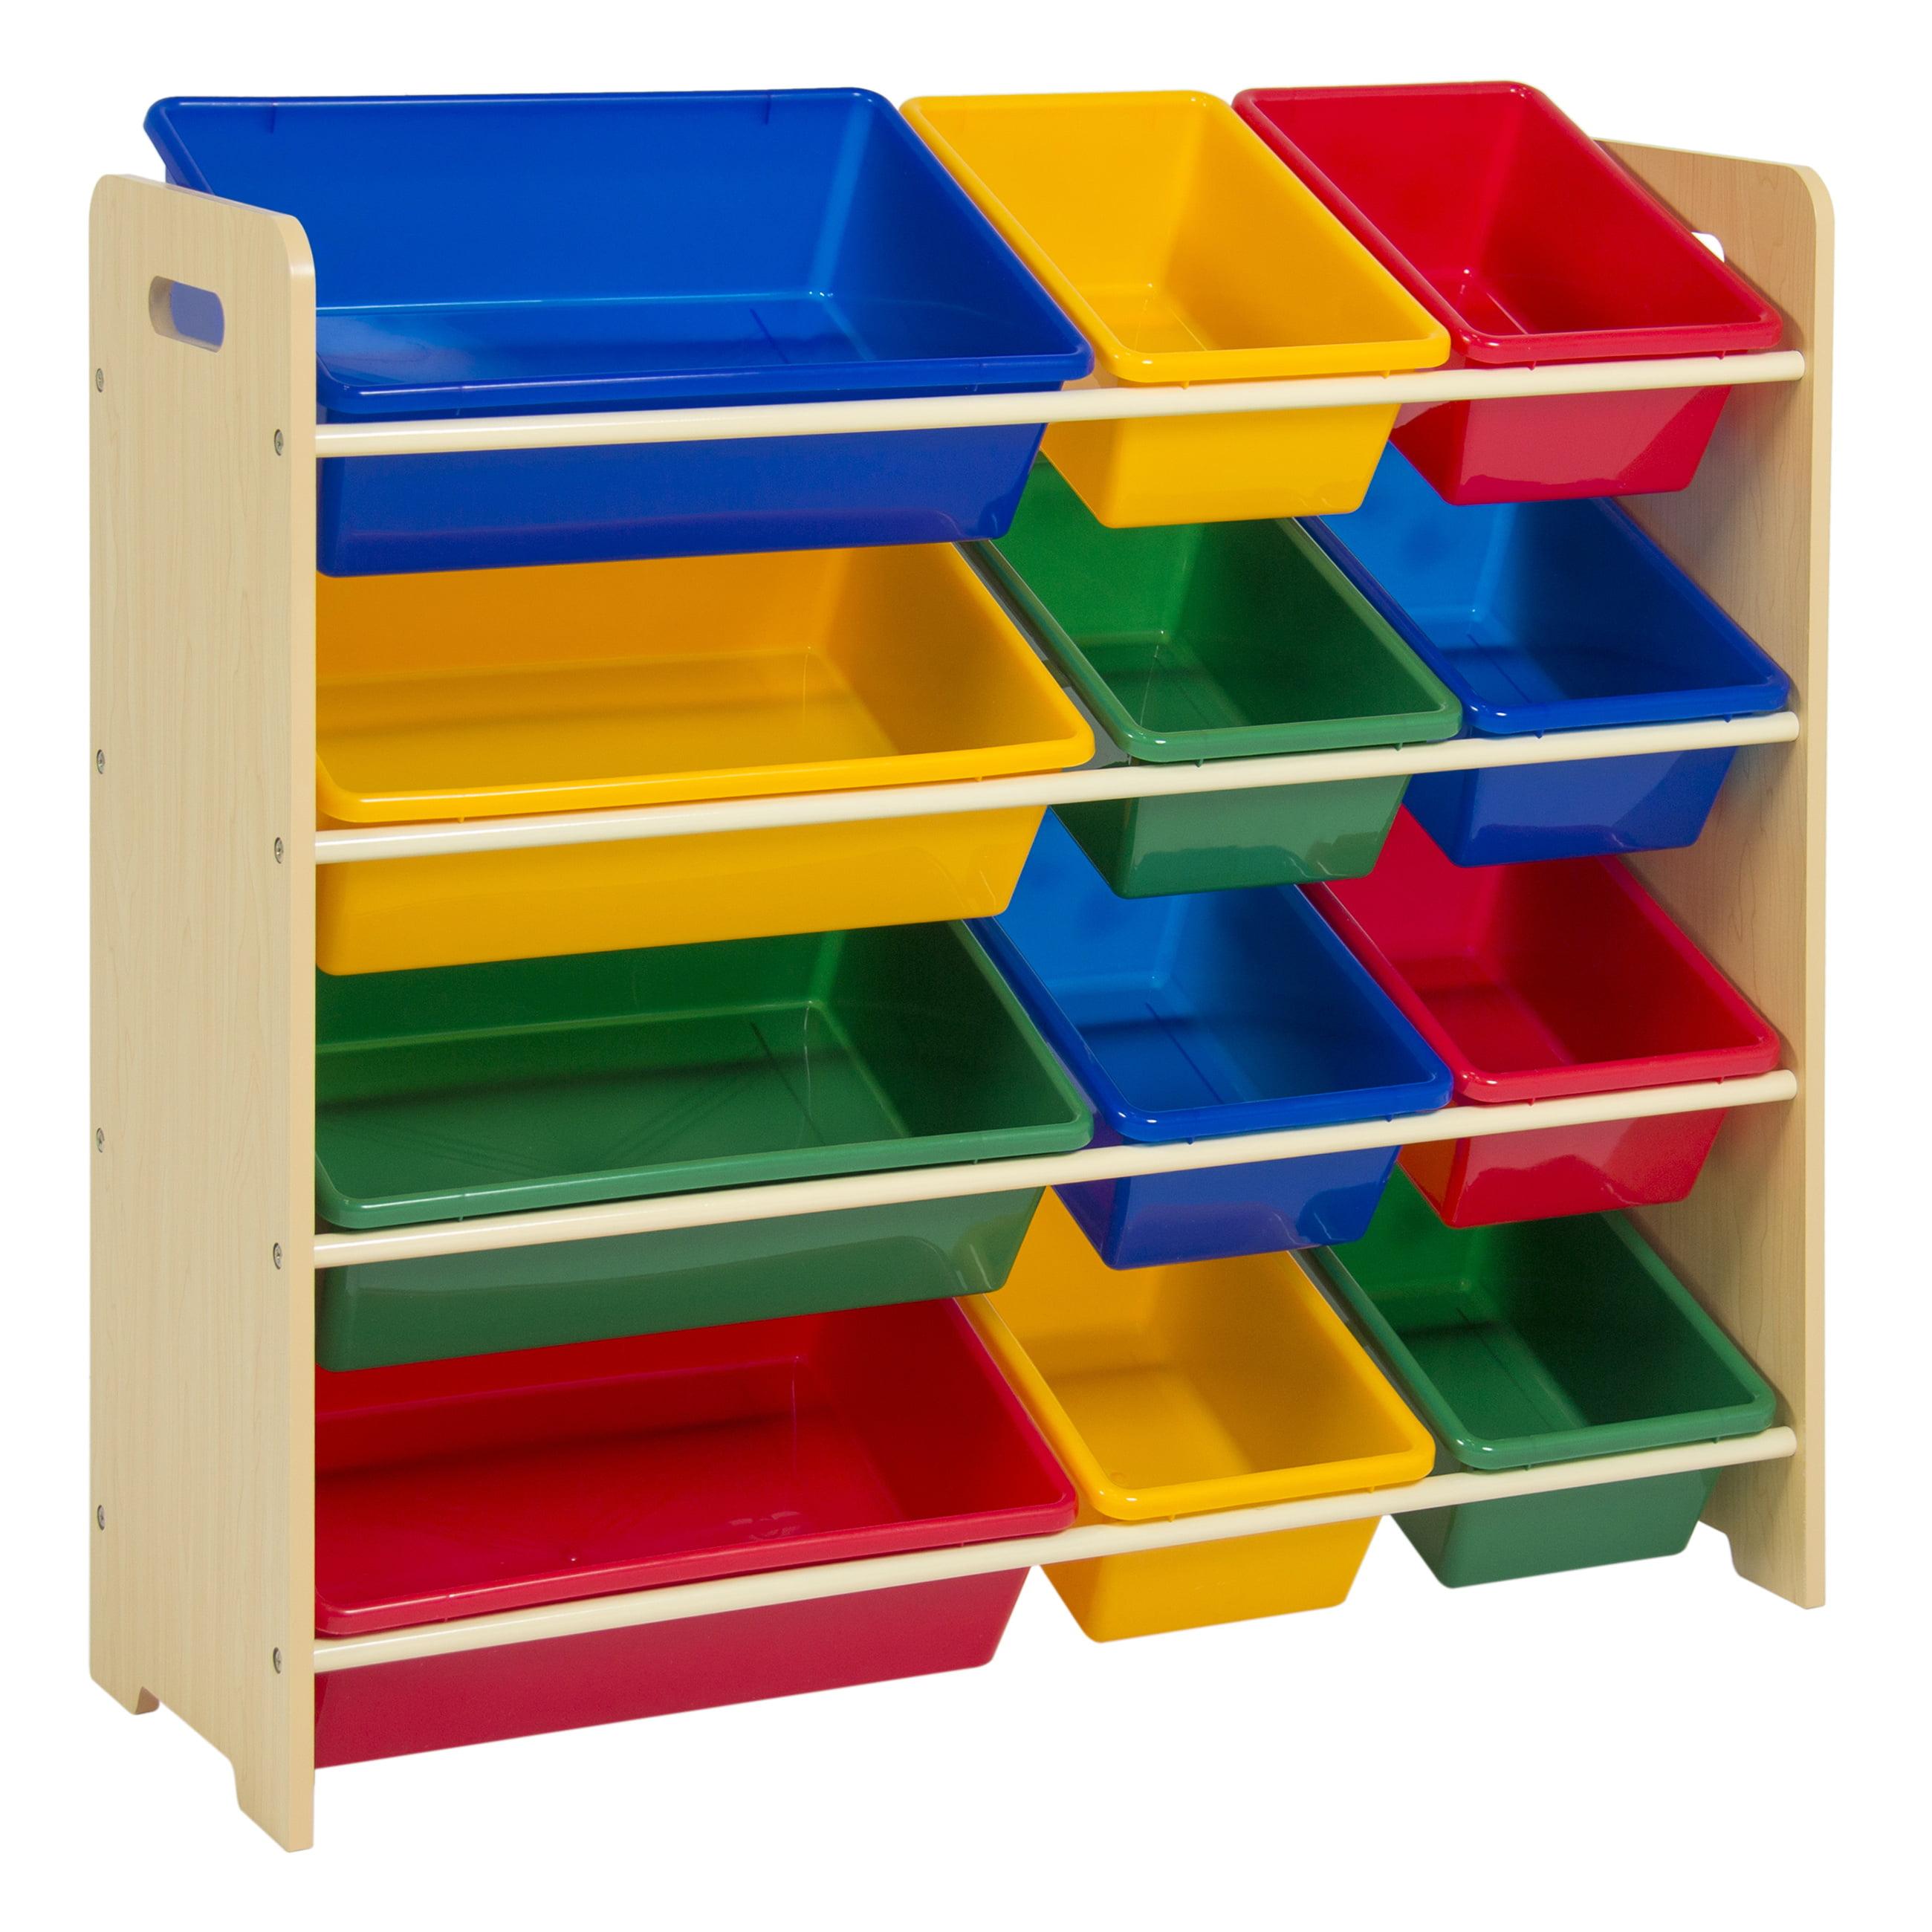 Best Choice Products Toy Bin Organizer Kids Childrens Storage Box Playroom Bedroom Shelf Drawer - Multicolors